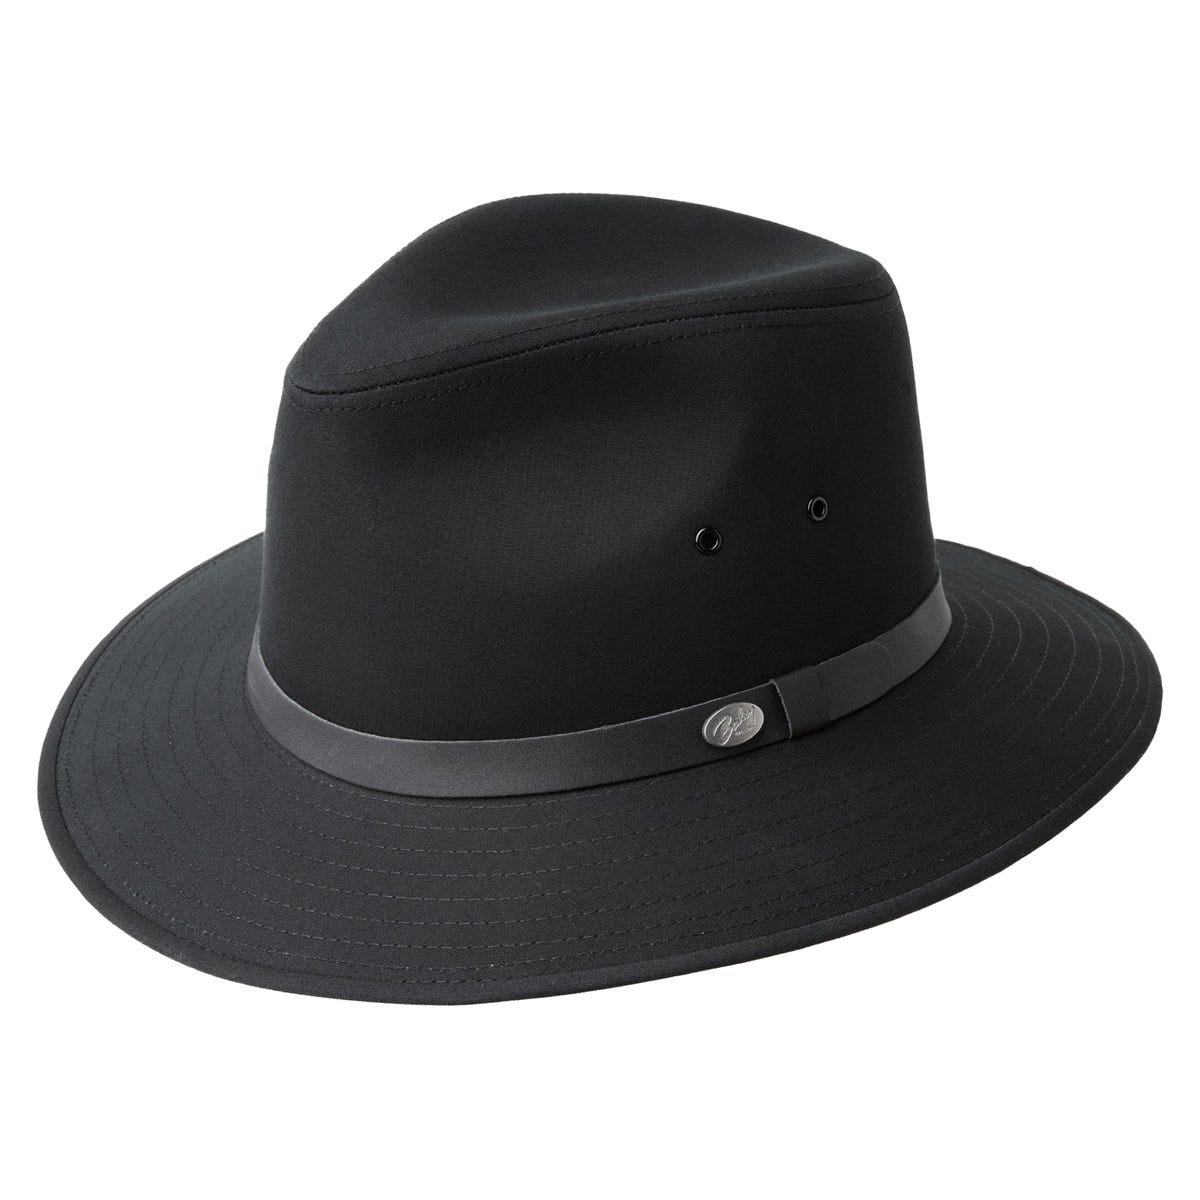 Men's Vintage Style Hats, Retro Hats Dalton Safari Outback $65.00 AT vintagedancer.com